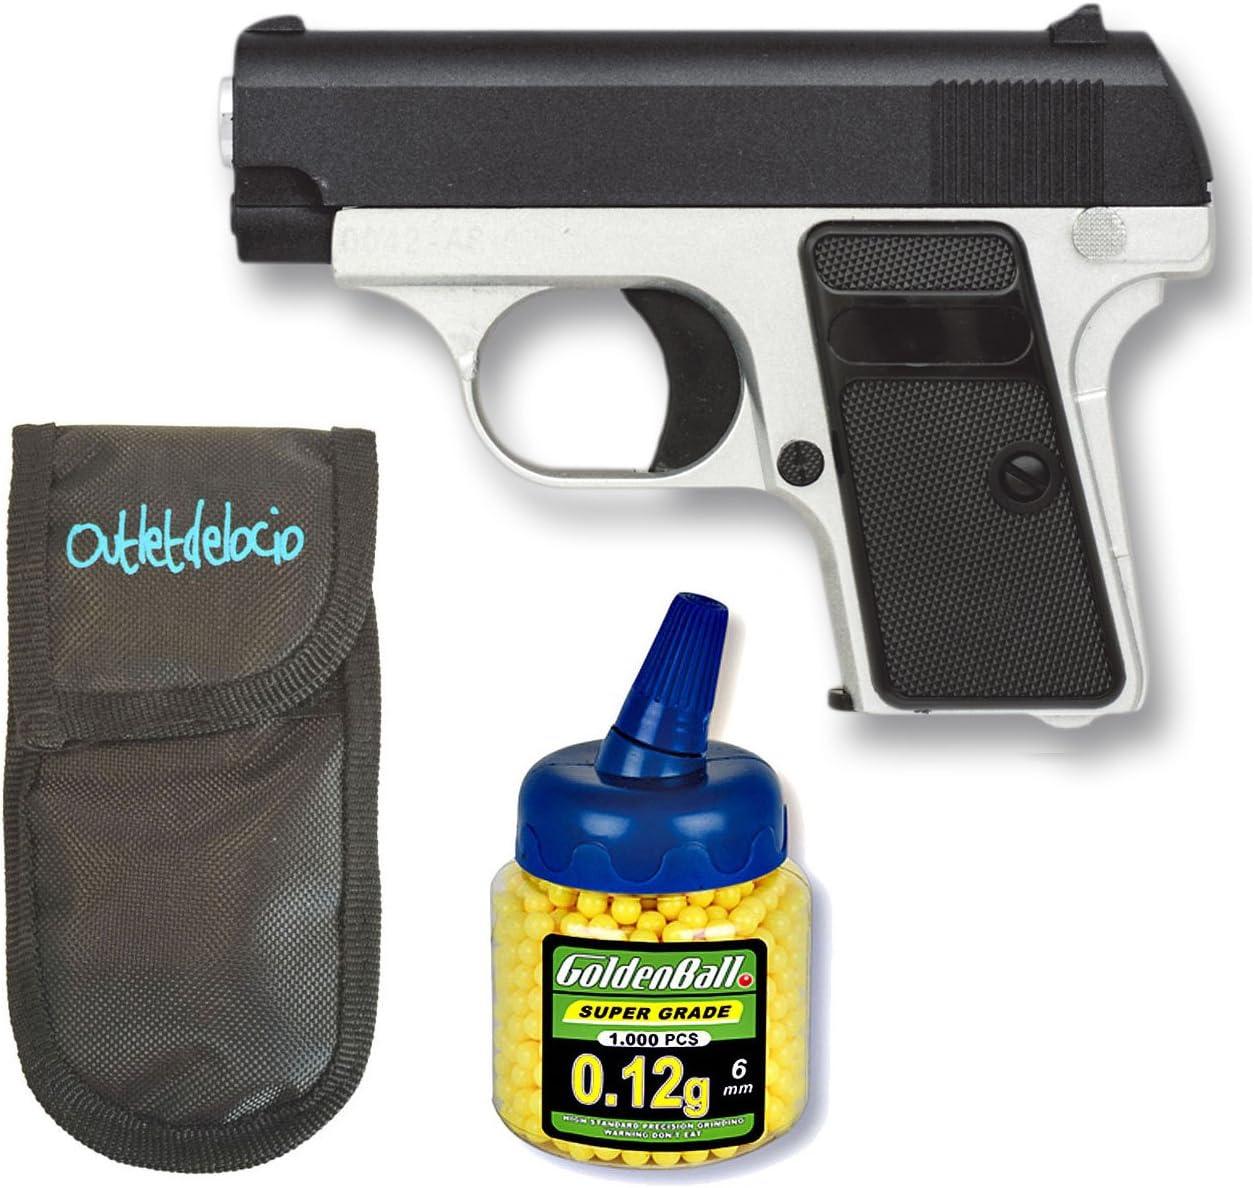 Outletdelocio. Pistola Airsoft Mini G1, Metalica. Calibre 6mm. + Funda Portabalines + Biberon 1000 Bolas. 50980/21993/23054